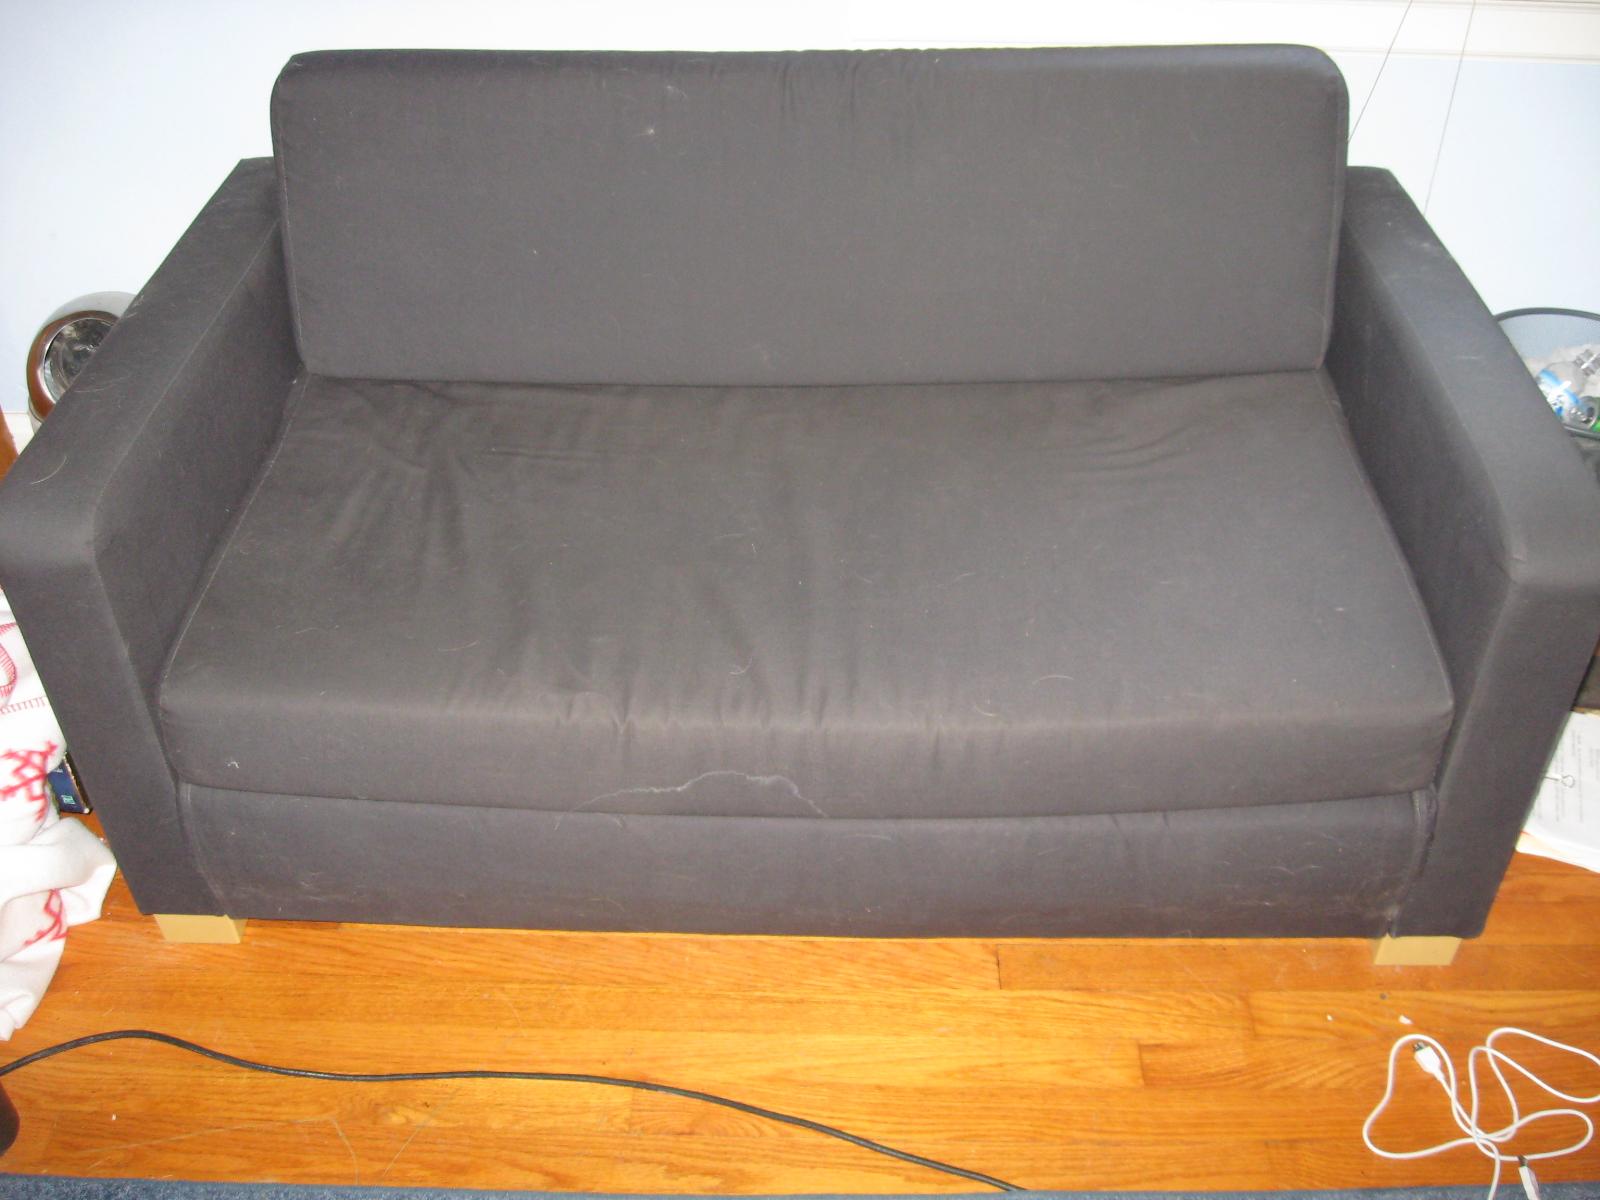 Anybody Buy Furniture From IKEA